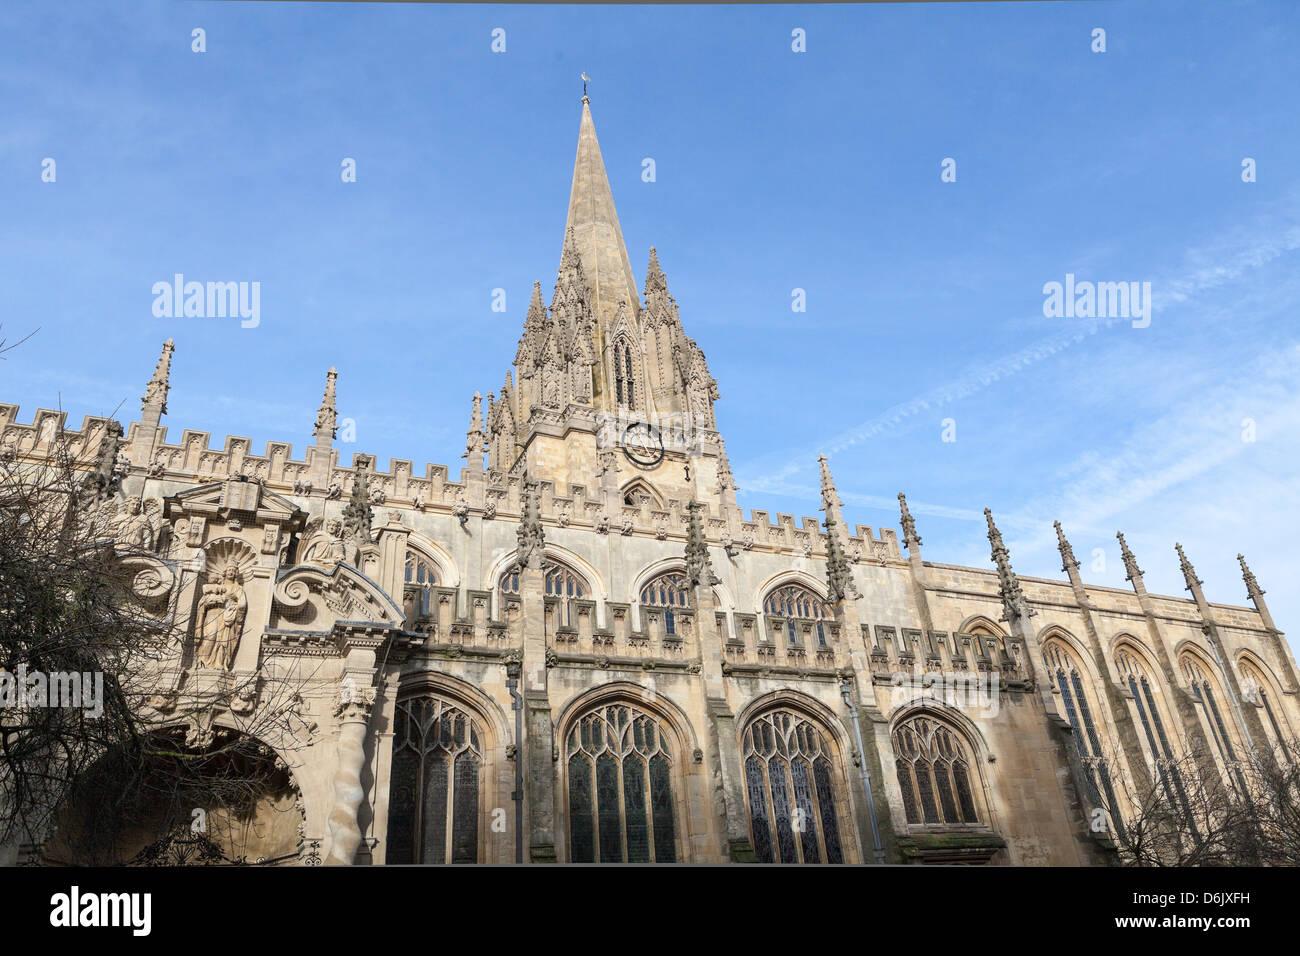 University Church of St. Mary the Virgin, Oxford, Oxfordshire, England, United Kingdom, Europe - Stock Image